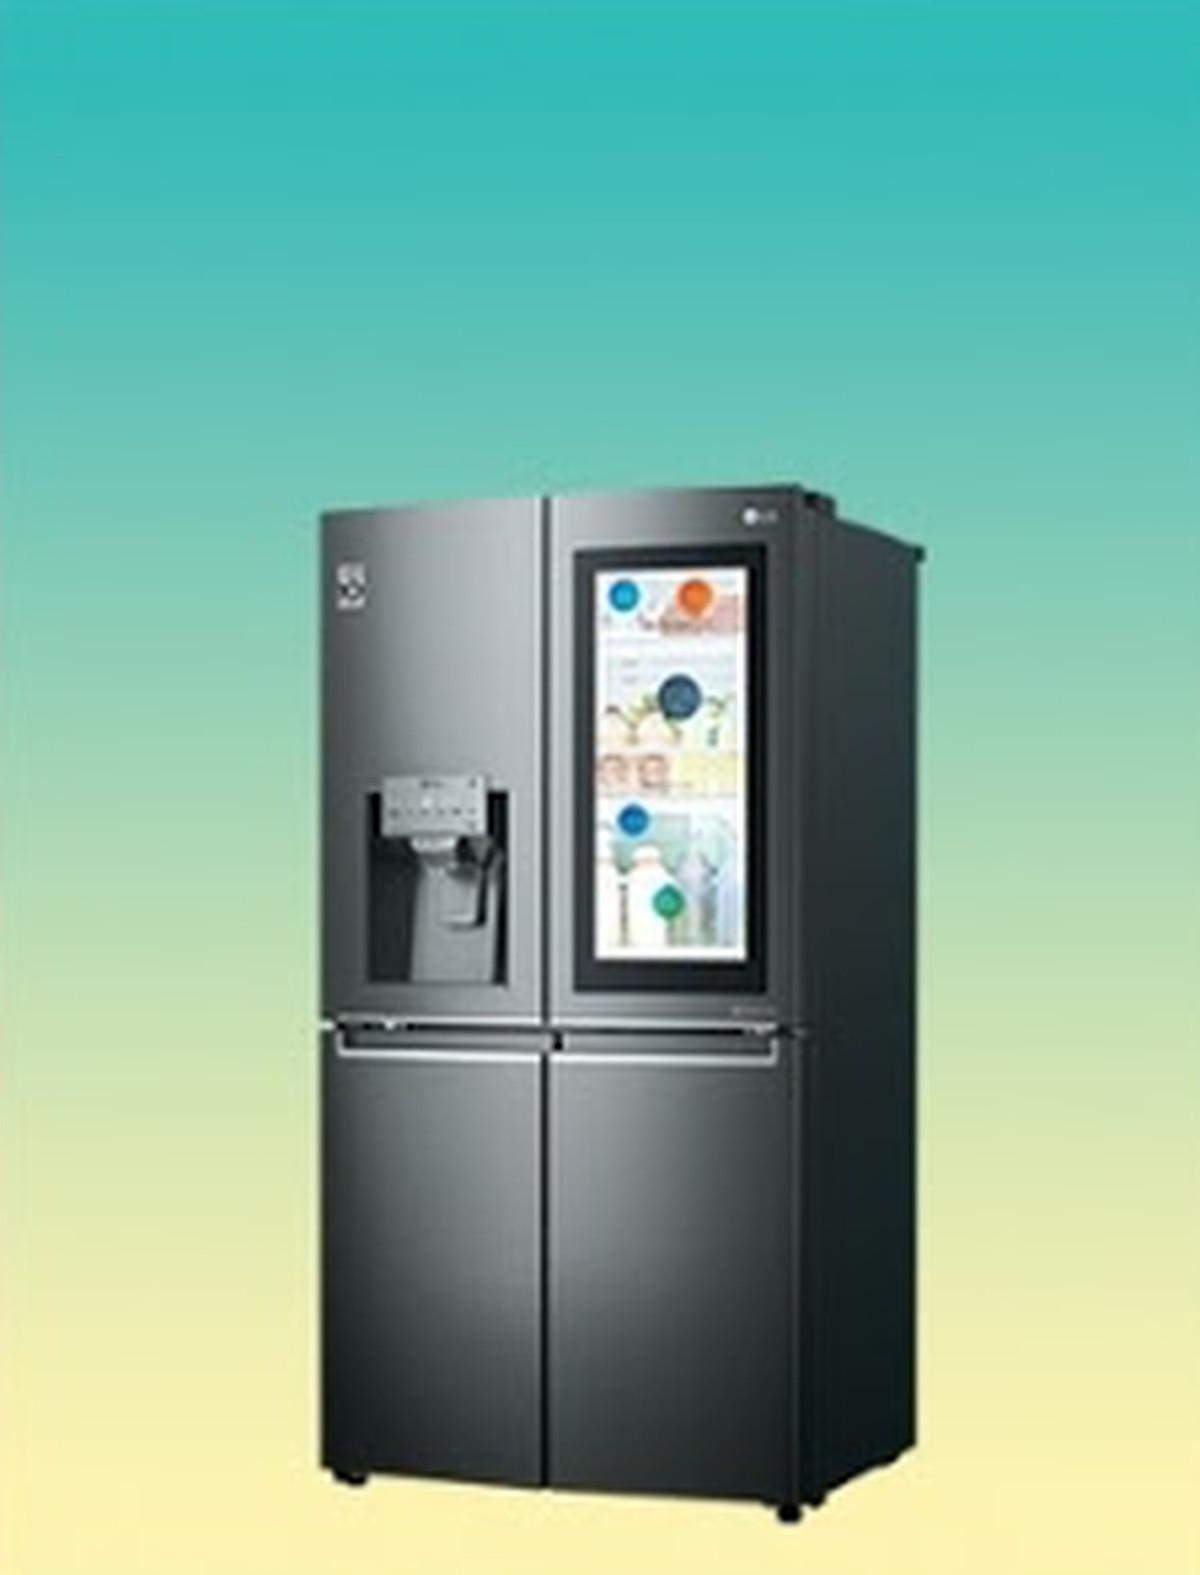 LG\'s new ThinQ smart fridge has a transparent 29-inch touchscreen ...